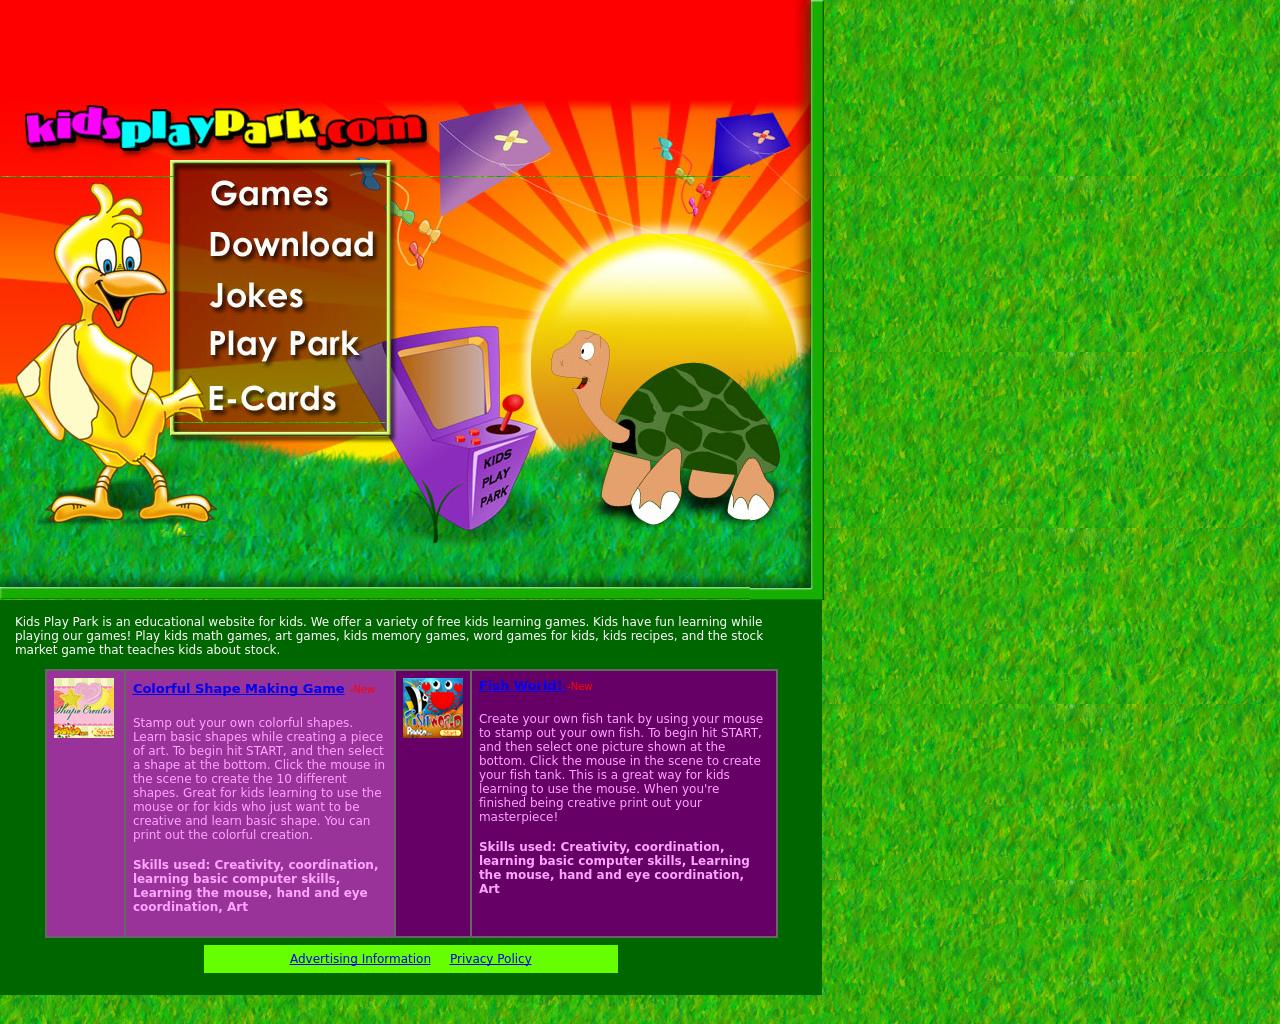 Kids-Play-Park-Advertising-Reviews-Pricing